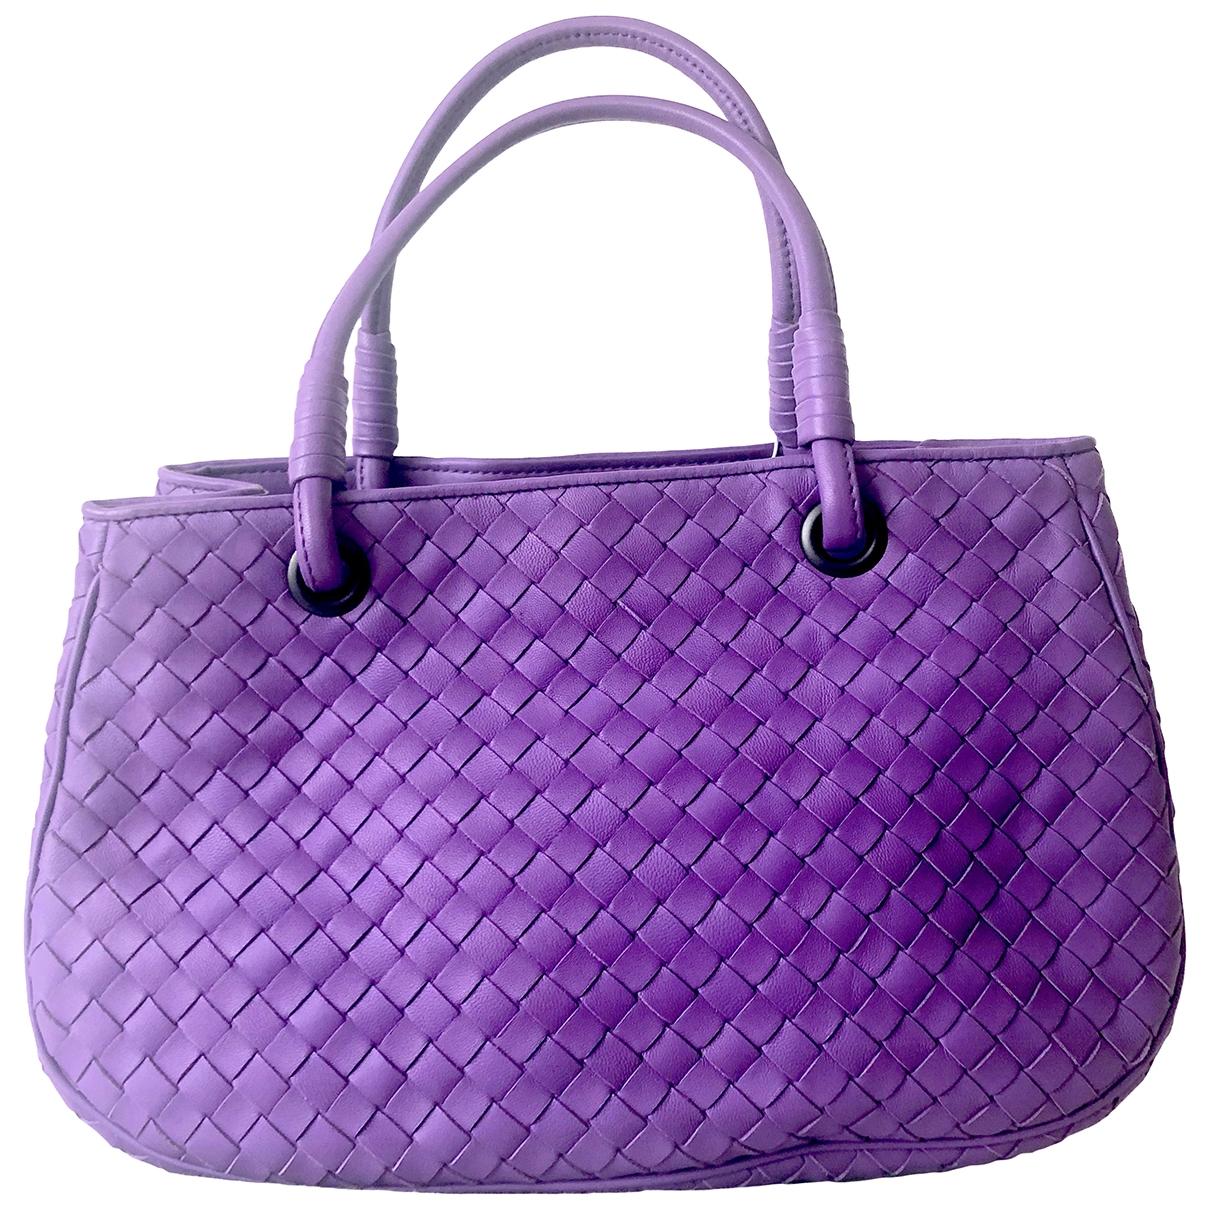 Bottega Veneta \N Handtasche in  Lila Leder